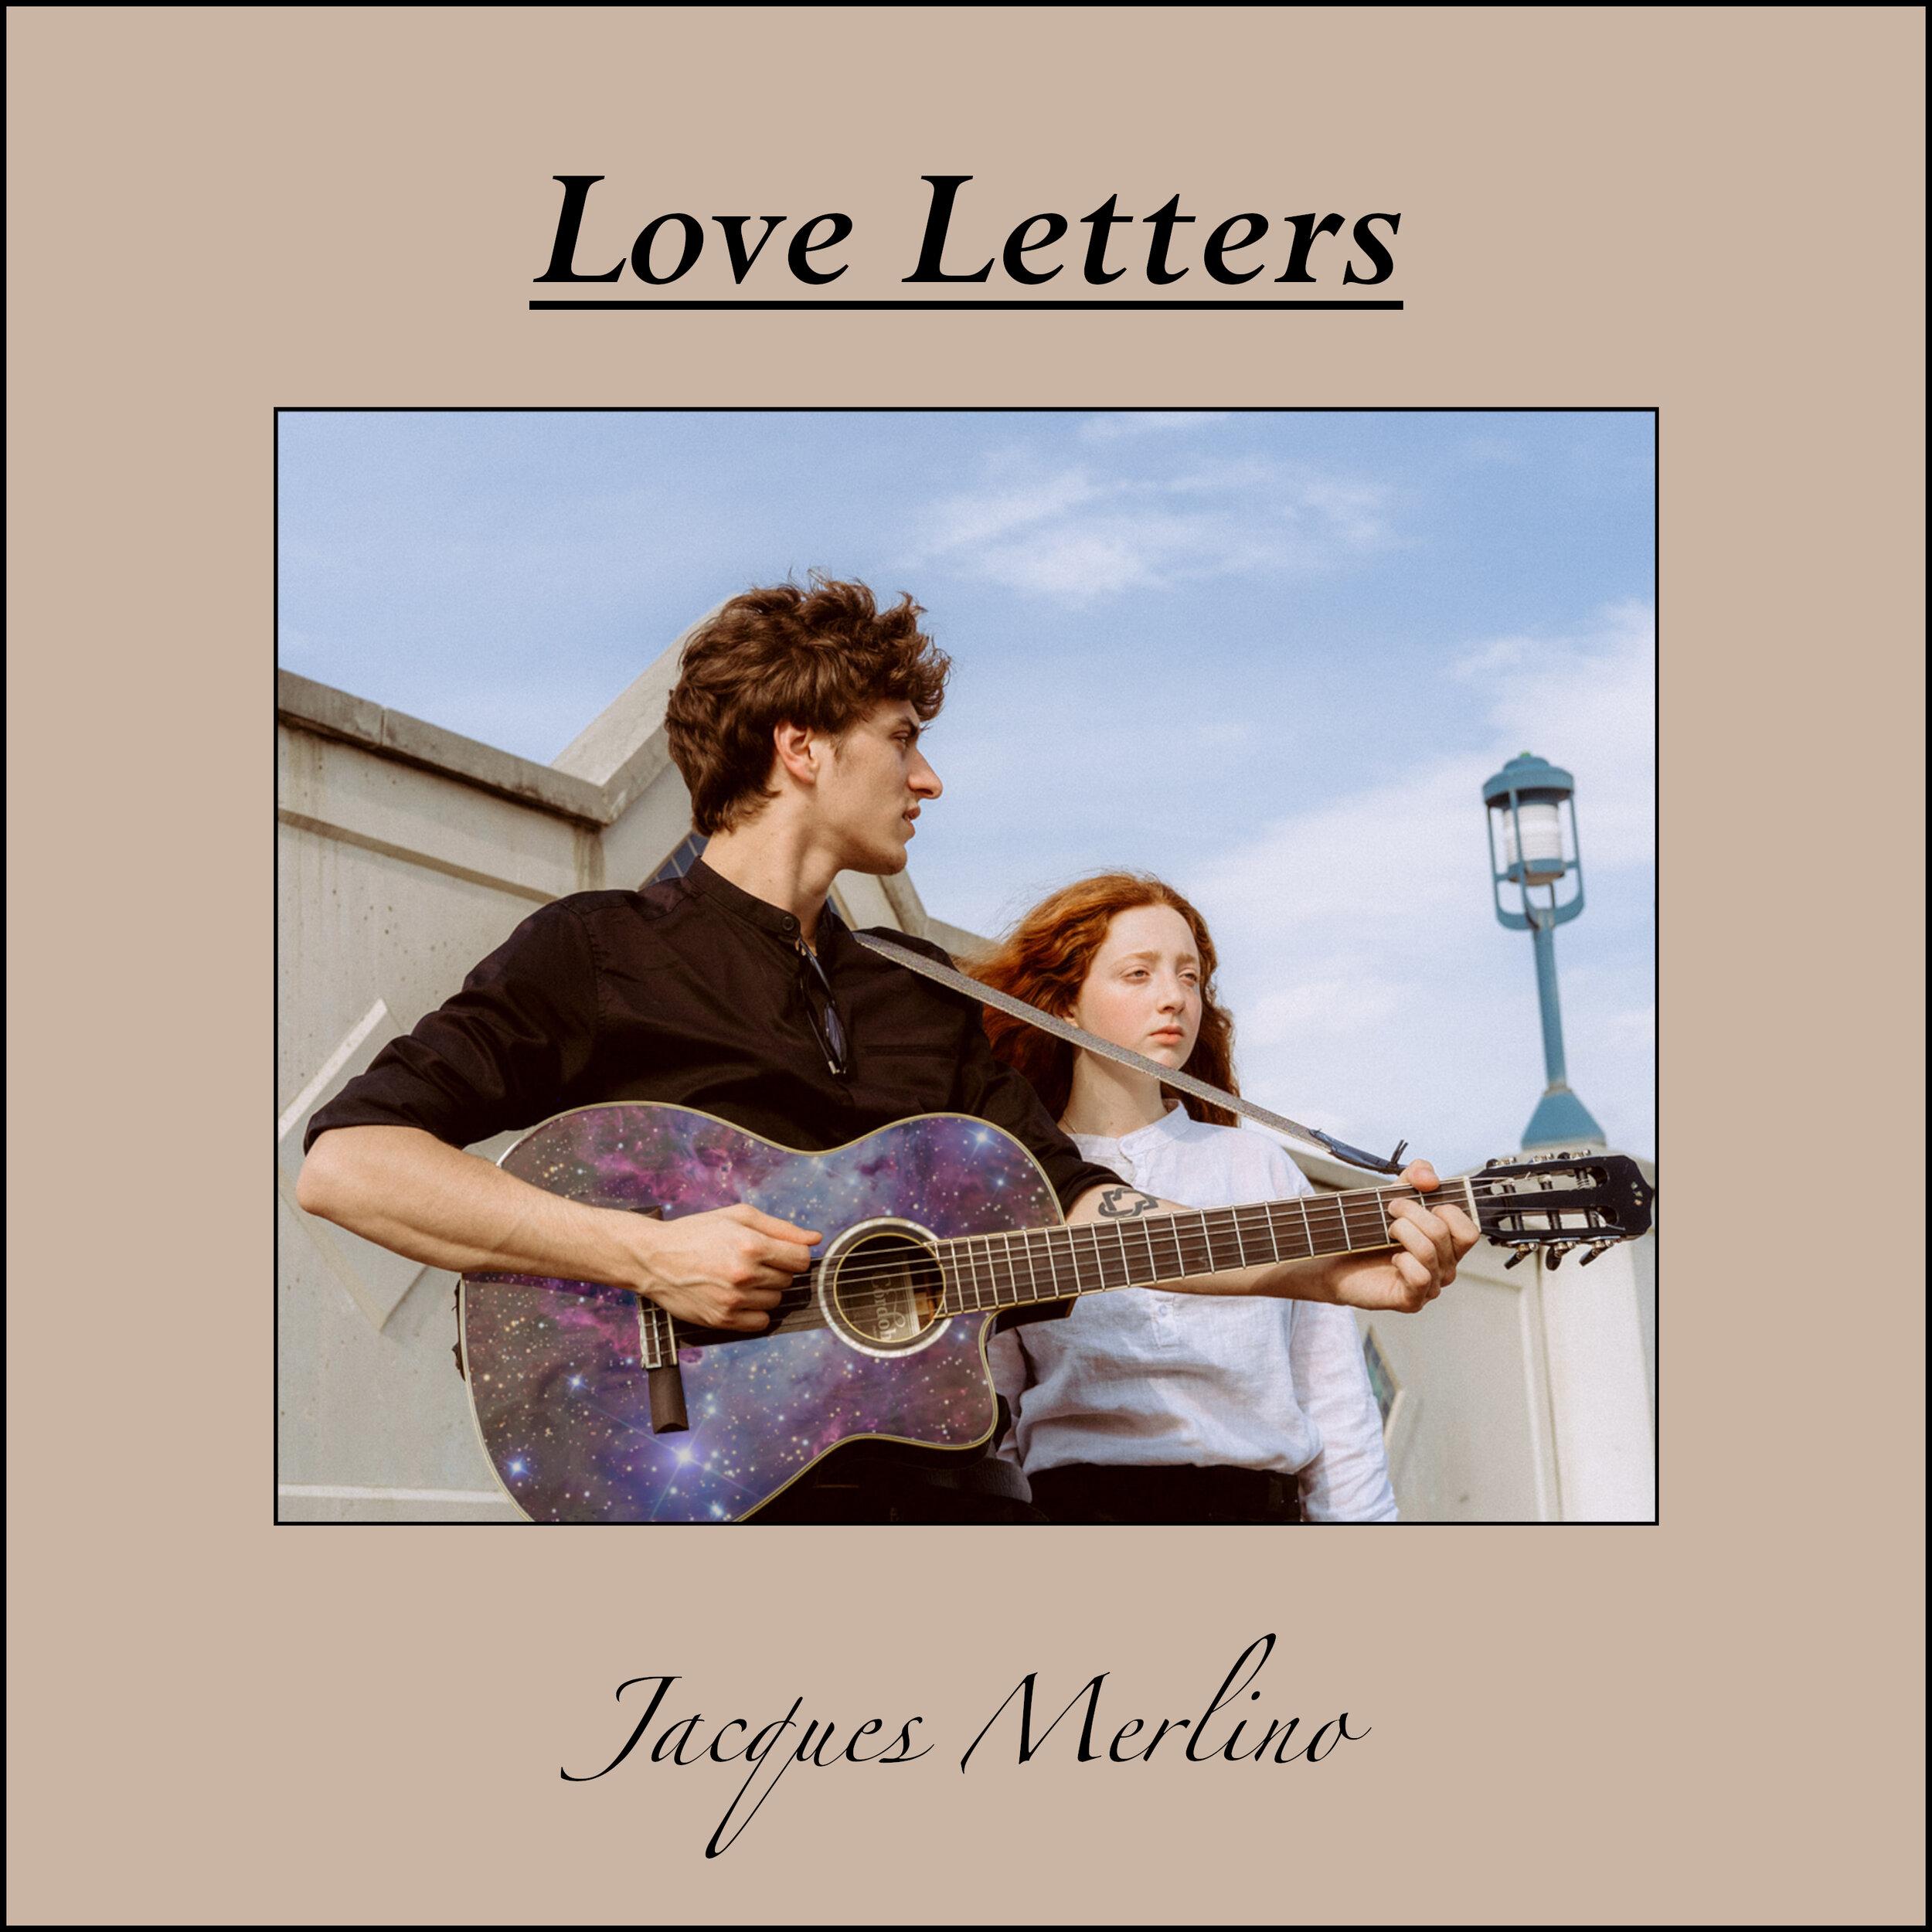 Love Letters II Cover.jpg